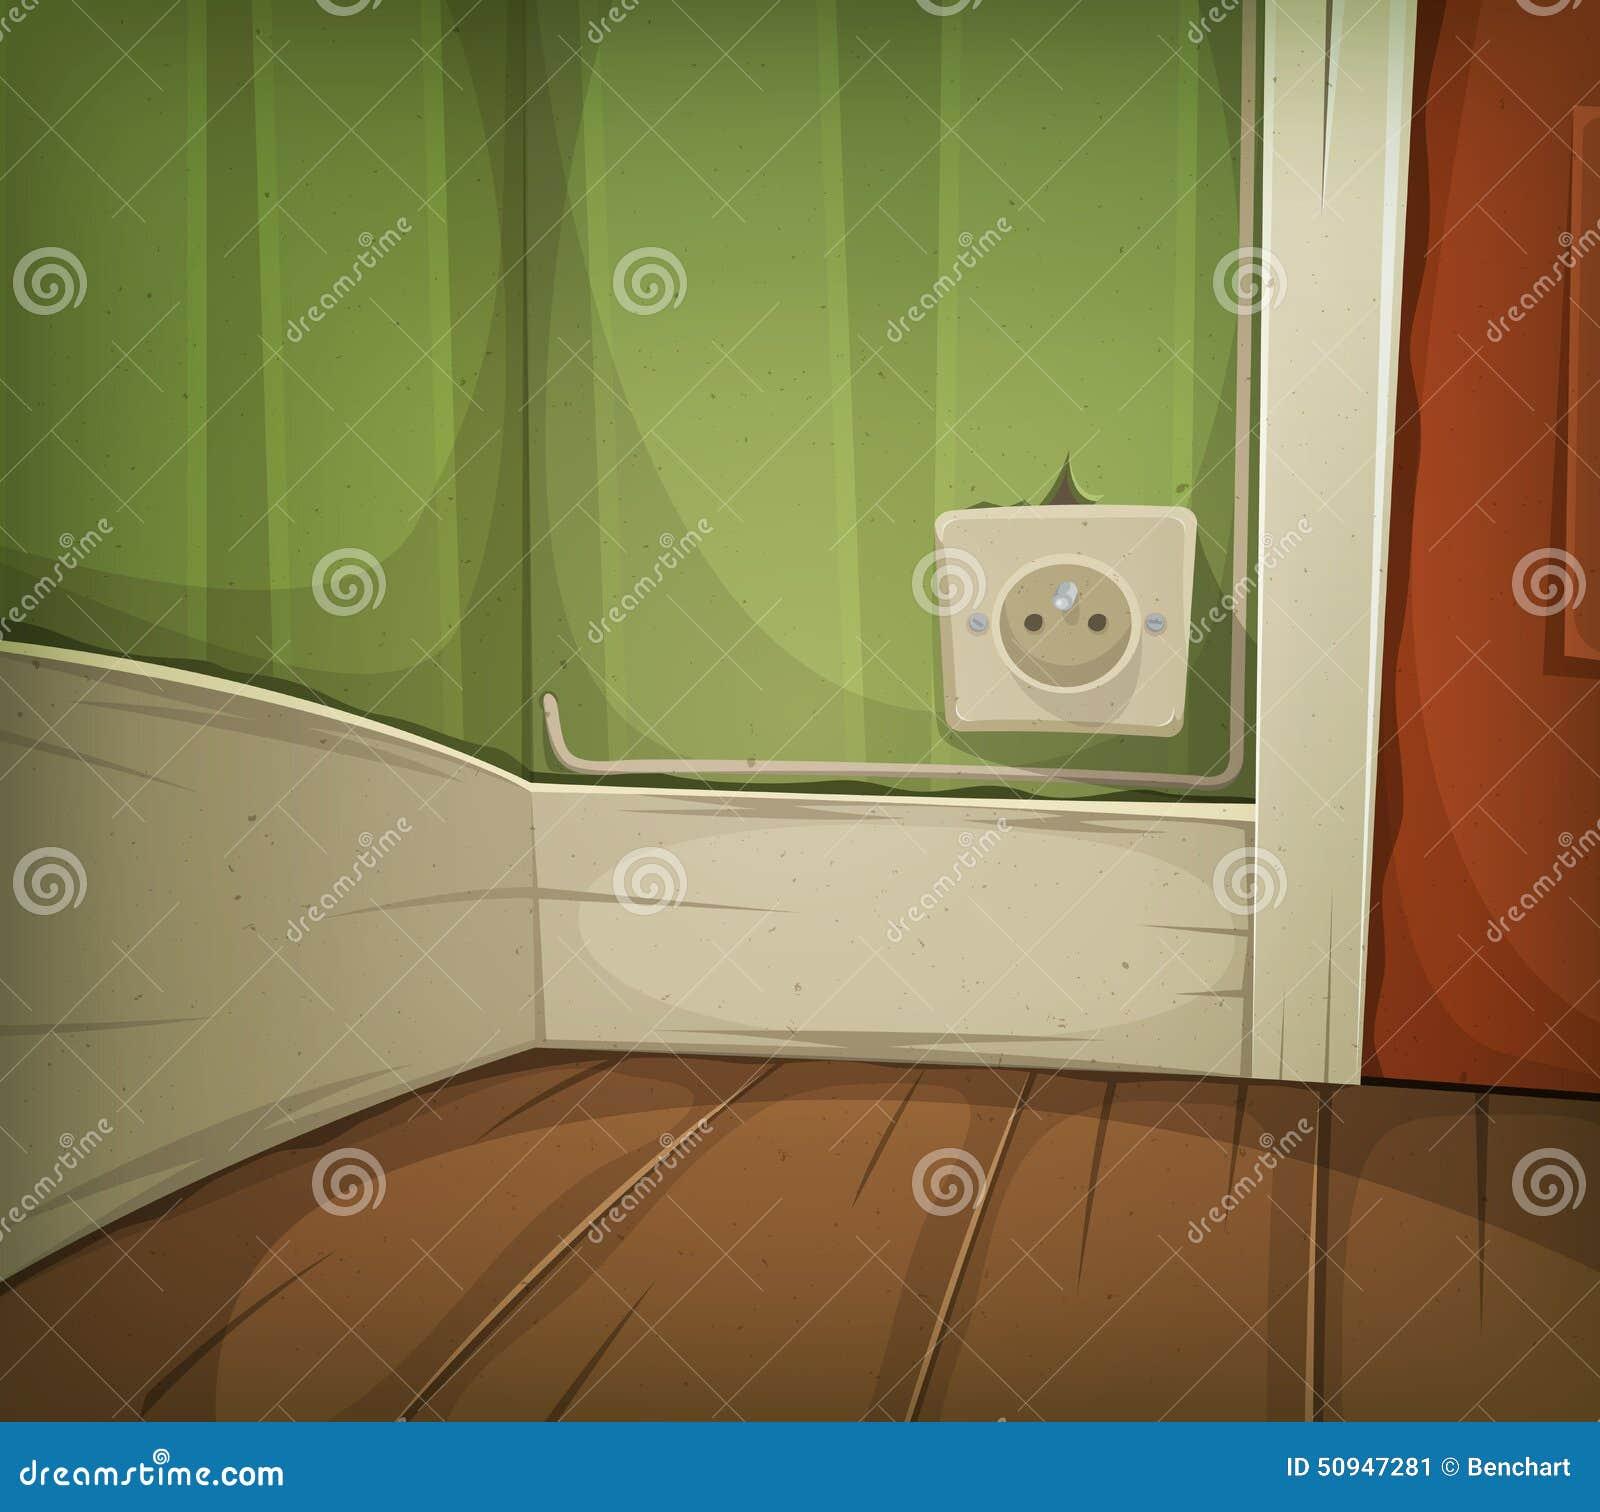 Cartoon Corner Of Room Close Up Stock Vector Image 50947281